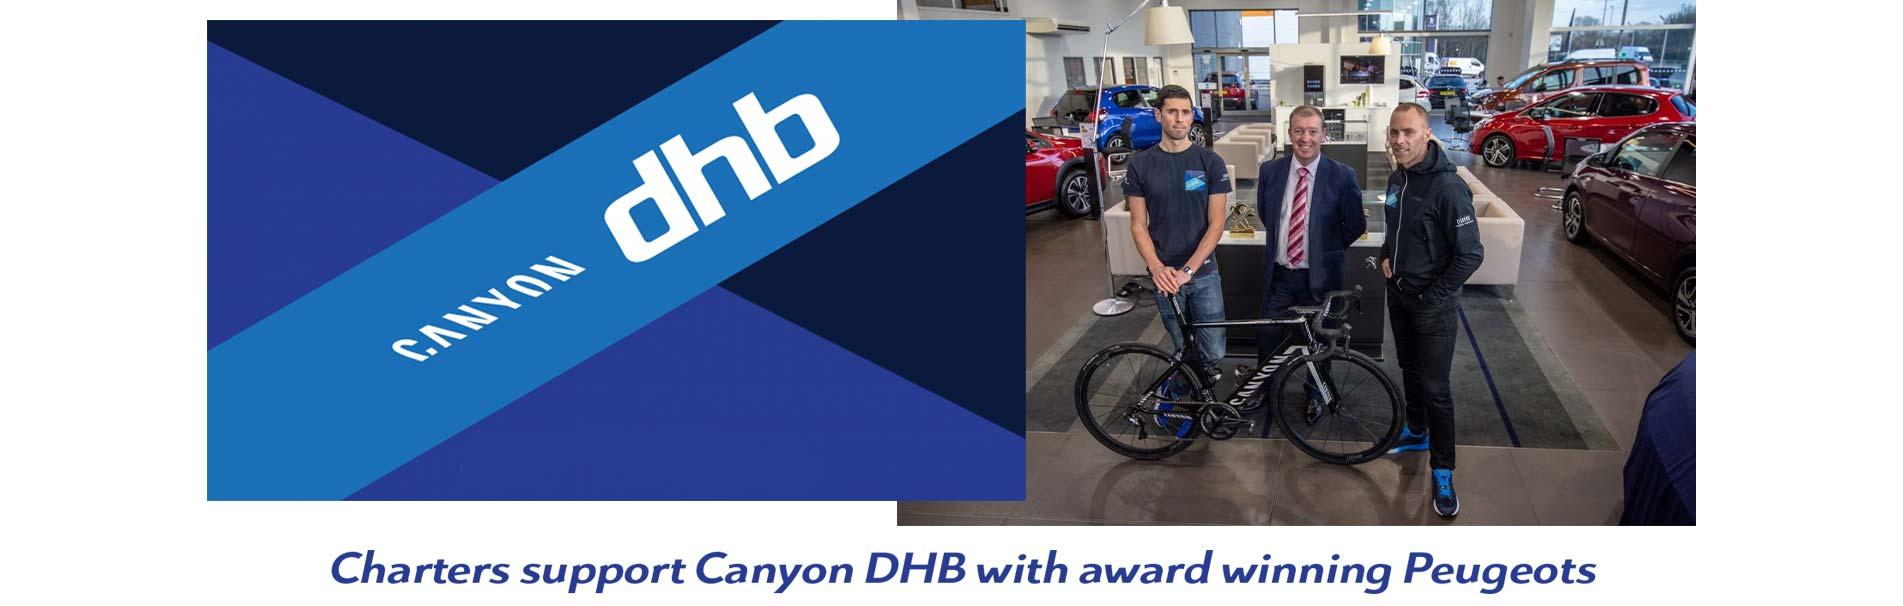 charters-peugeot-sponsoring-canyon-dhb-cycling-team-sli